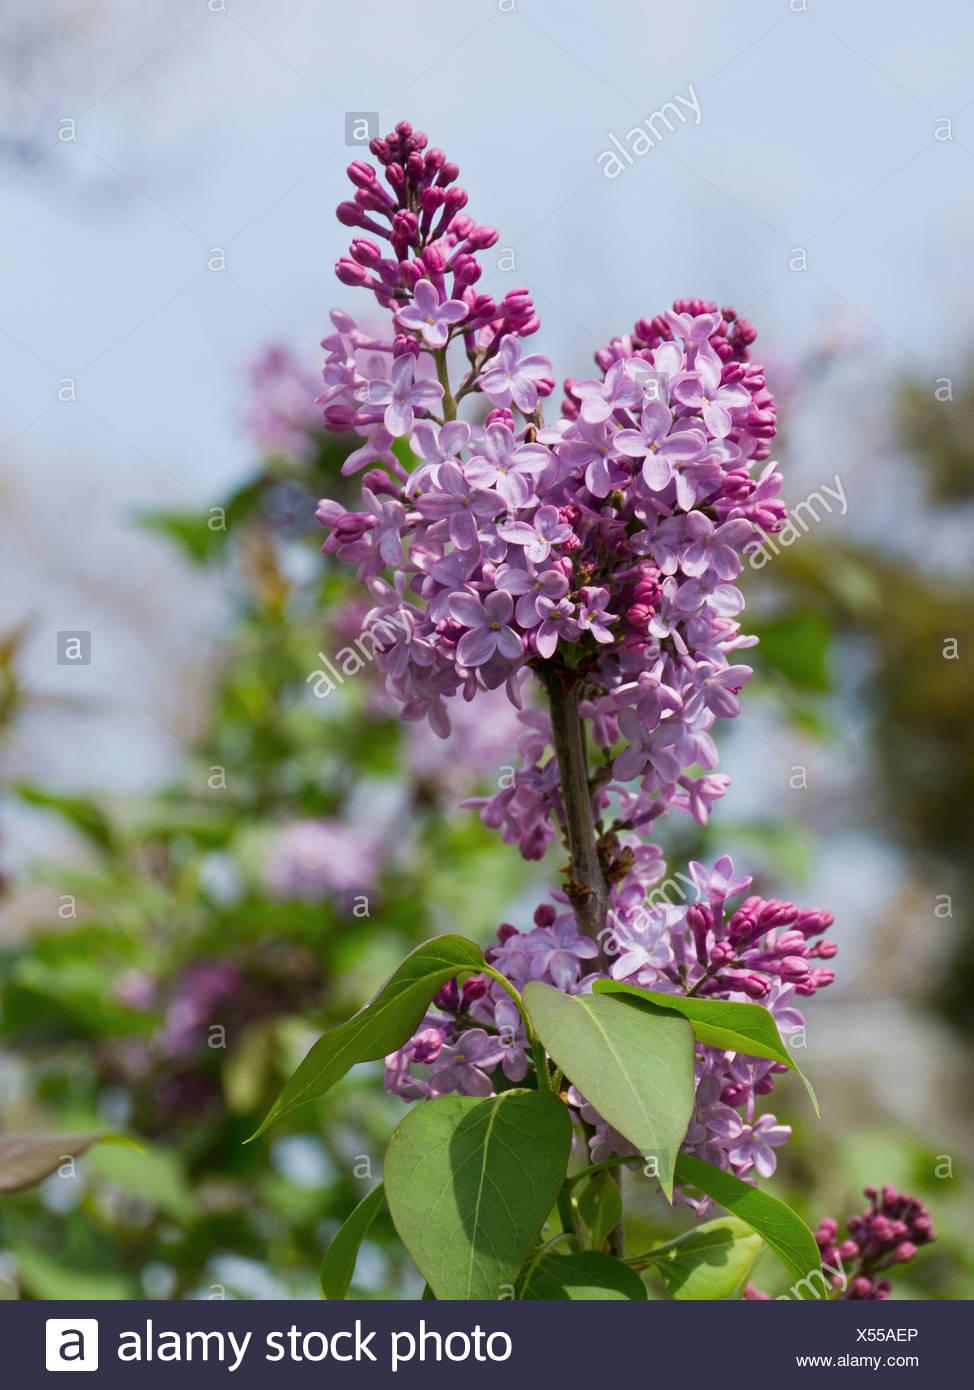 USA, Washington DC, Close up of lilac flowers - Stock Image